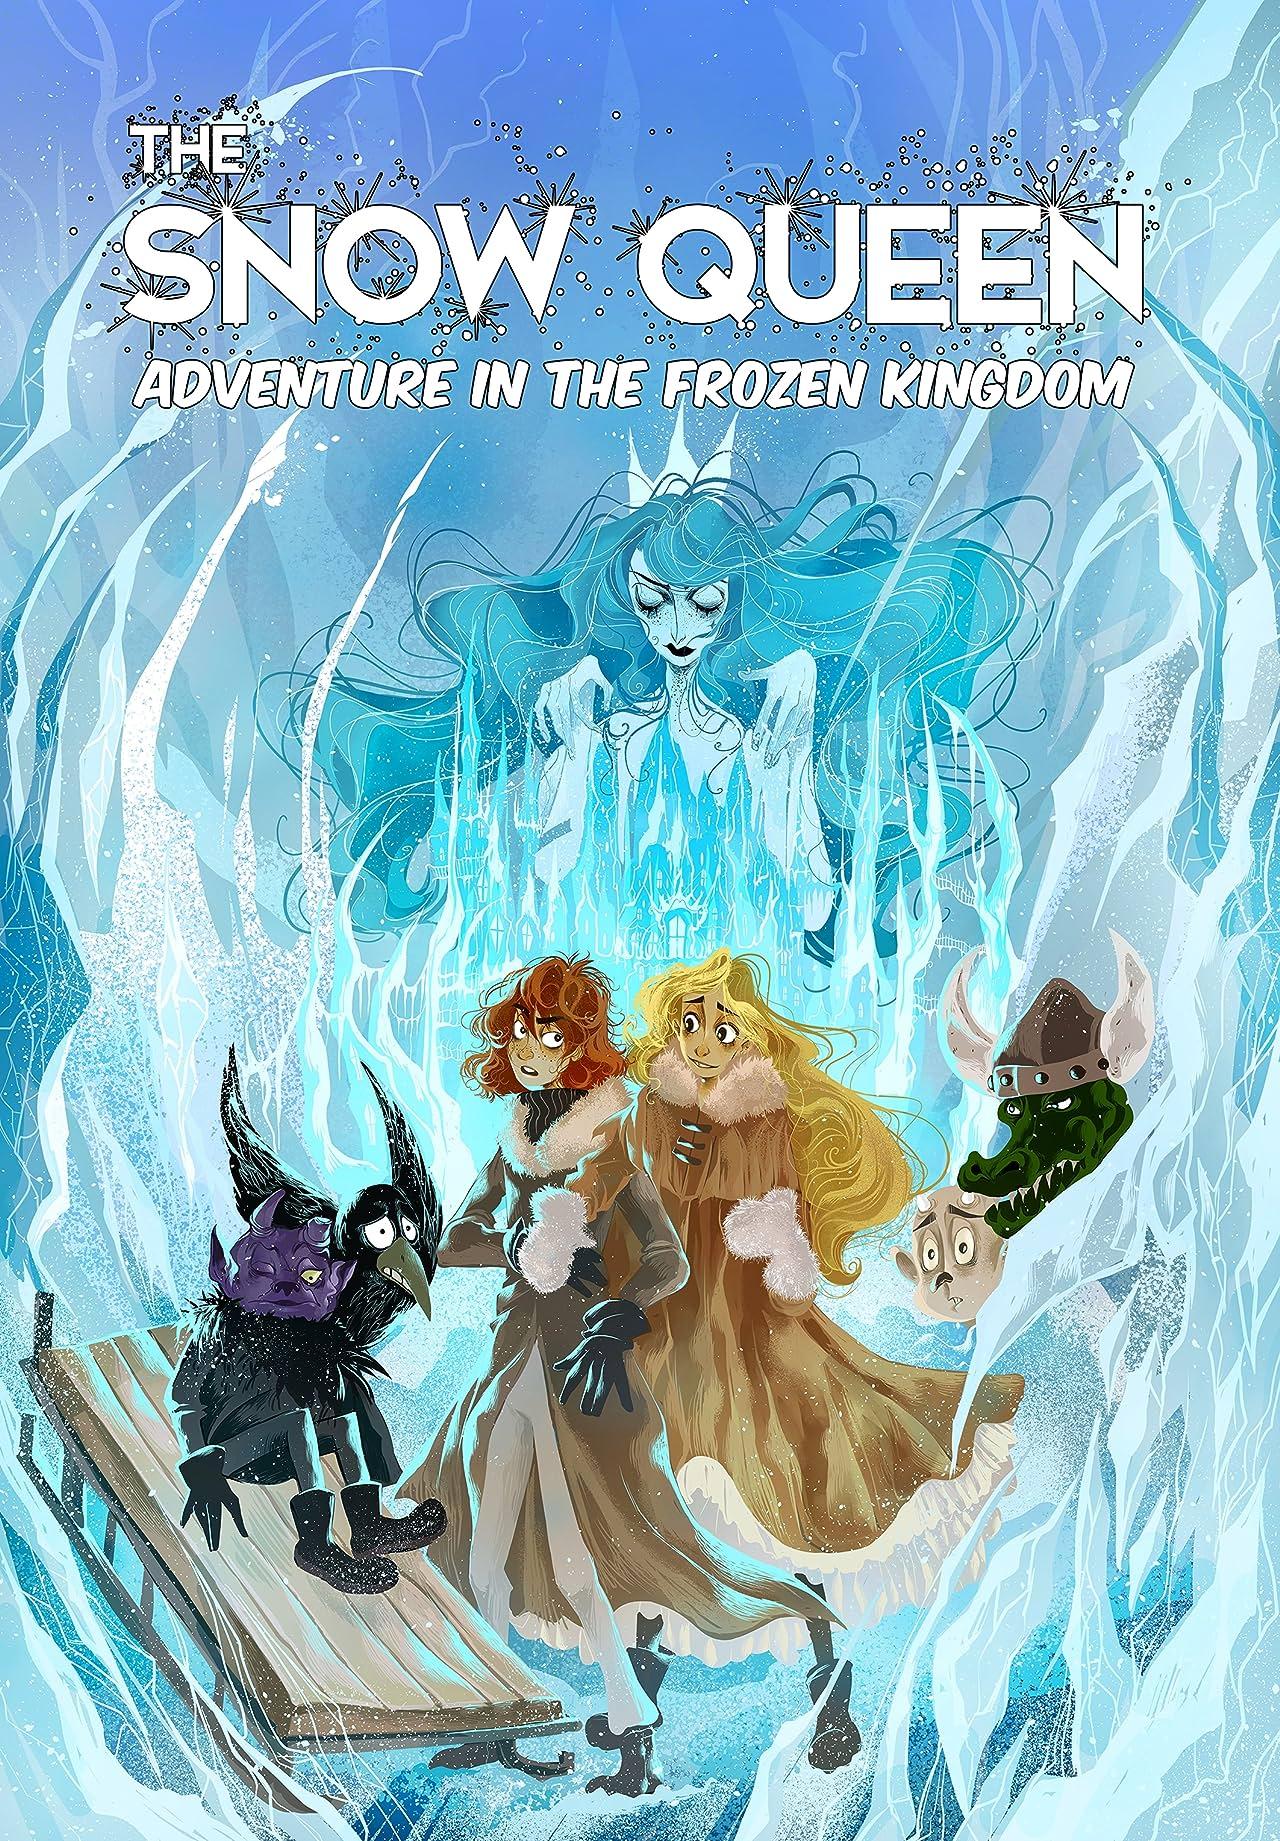 The Snow Queen: Adventure in the Frozen Kingdom